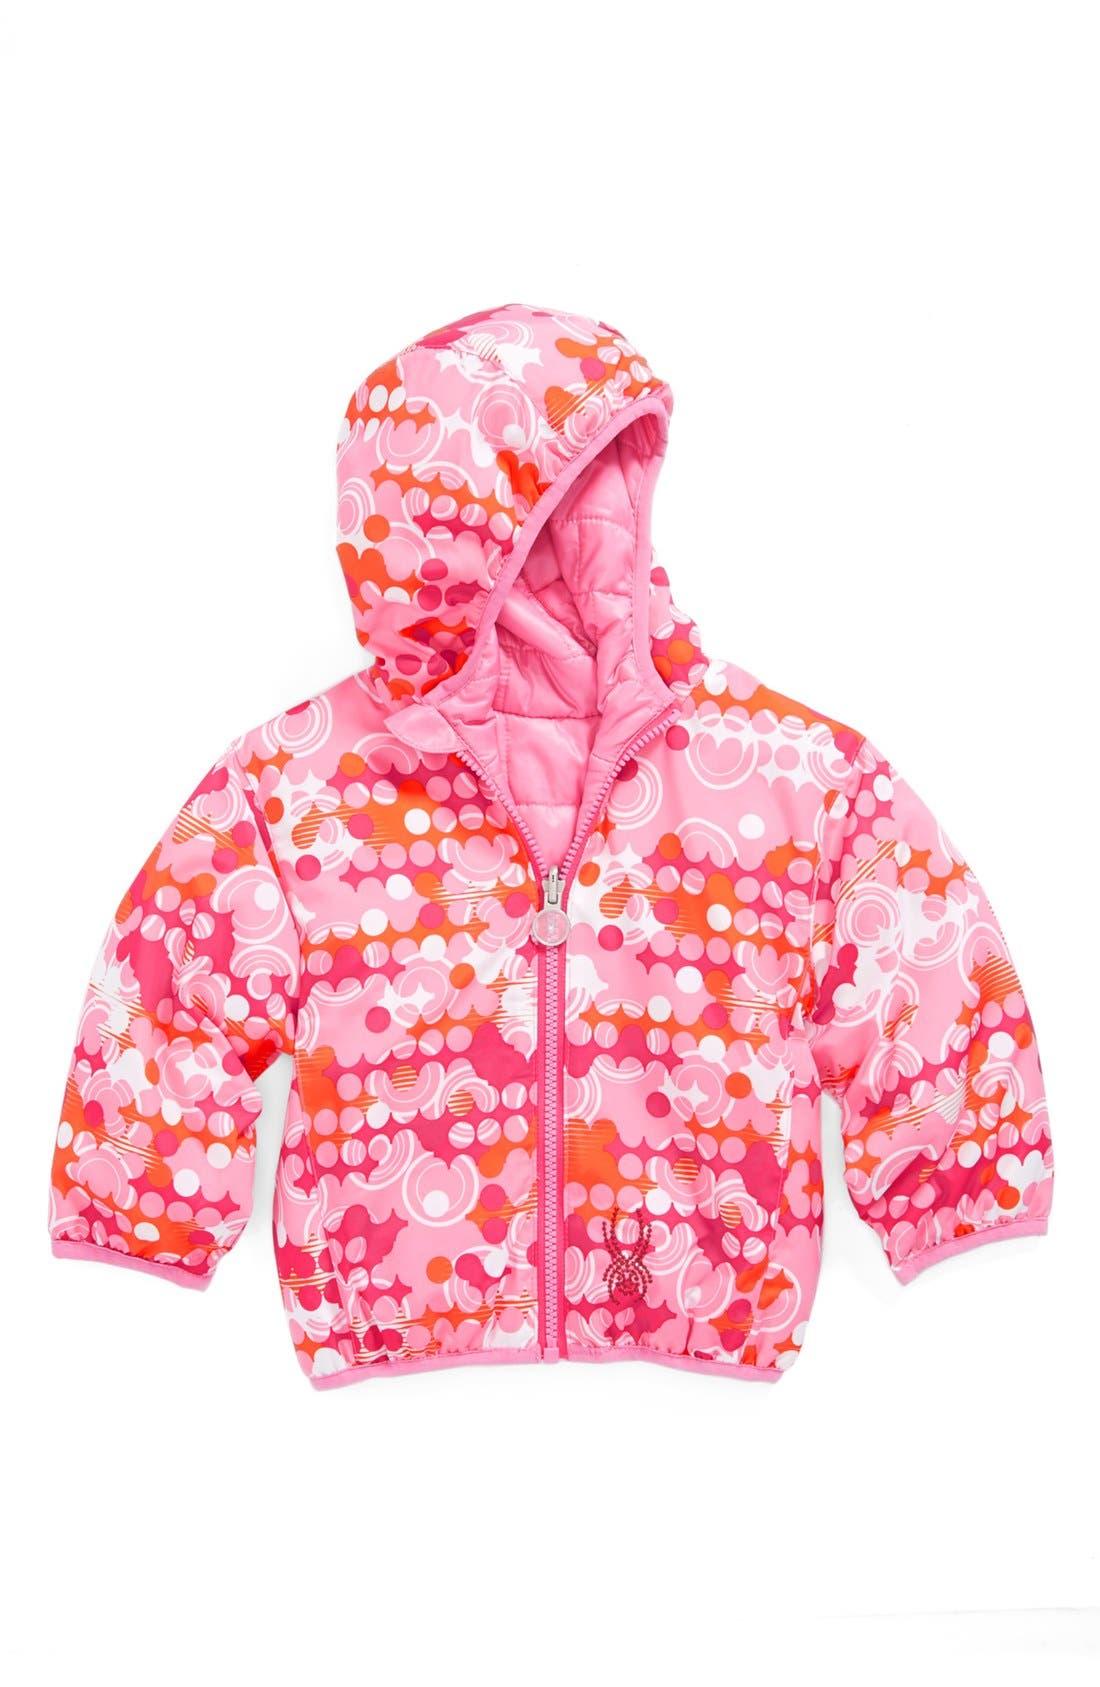 Alternate Image 1 Selected - Spyder 'Yummy' Reversible Jacket (Baby Girls)